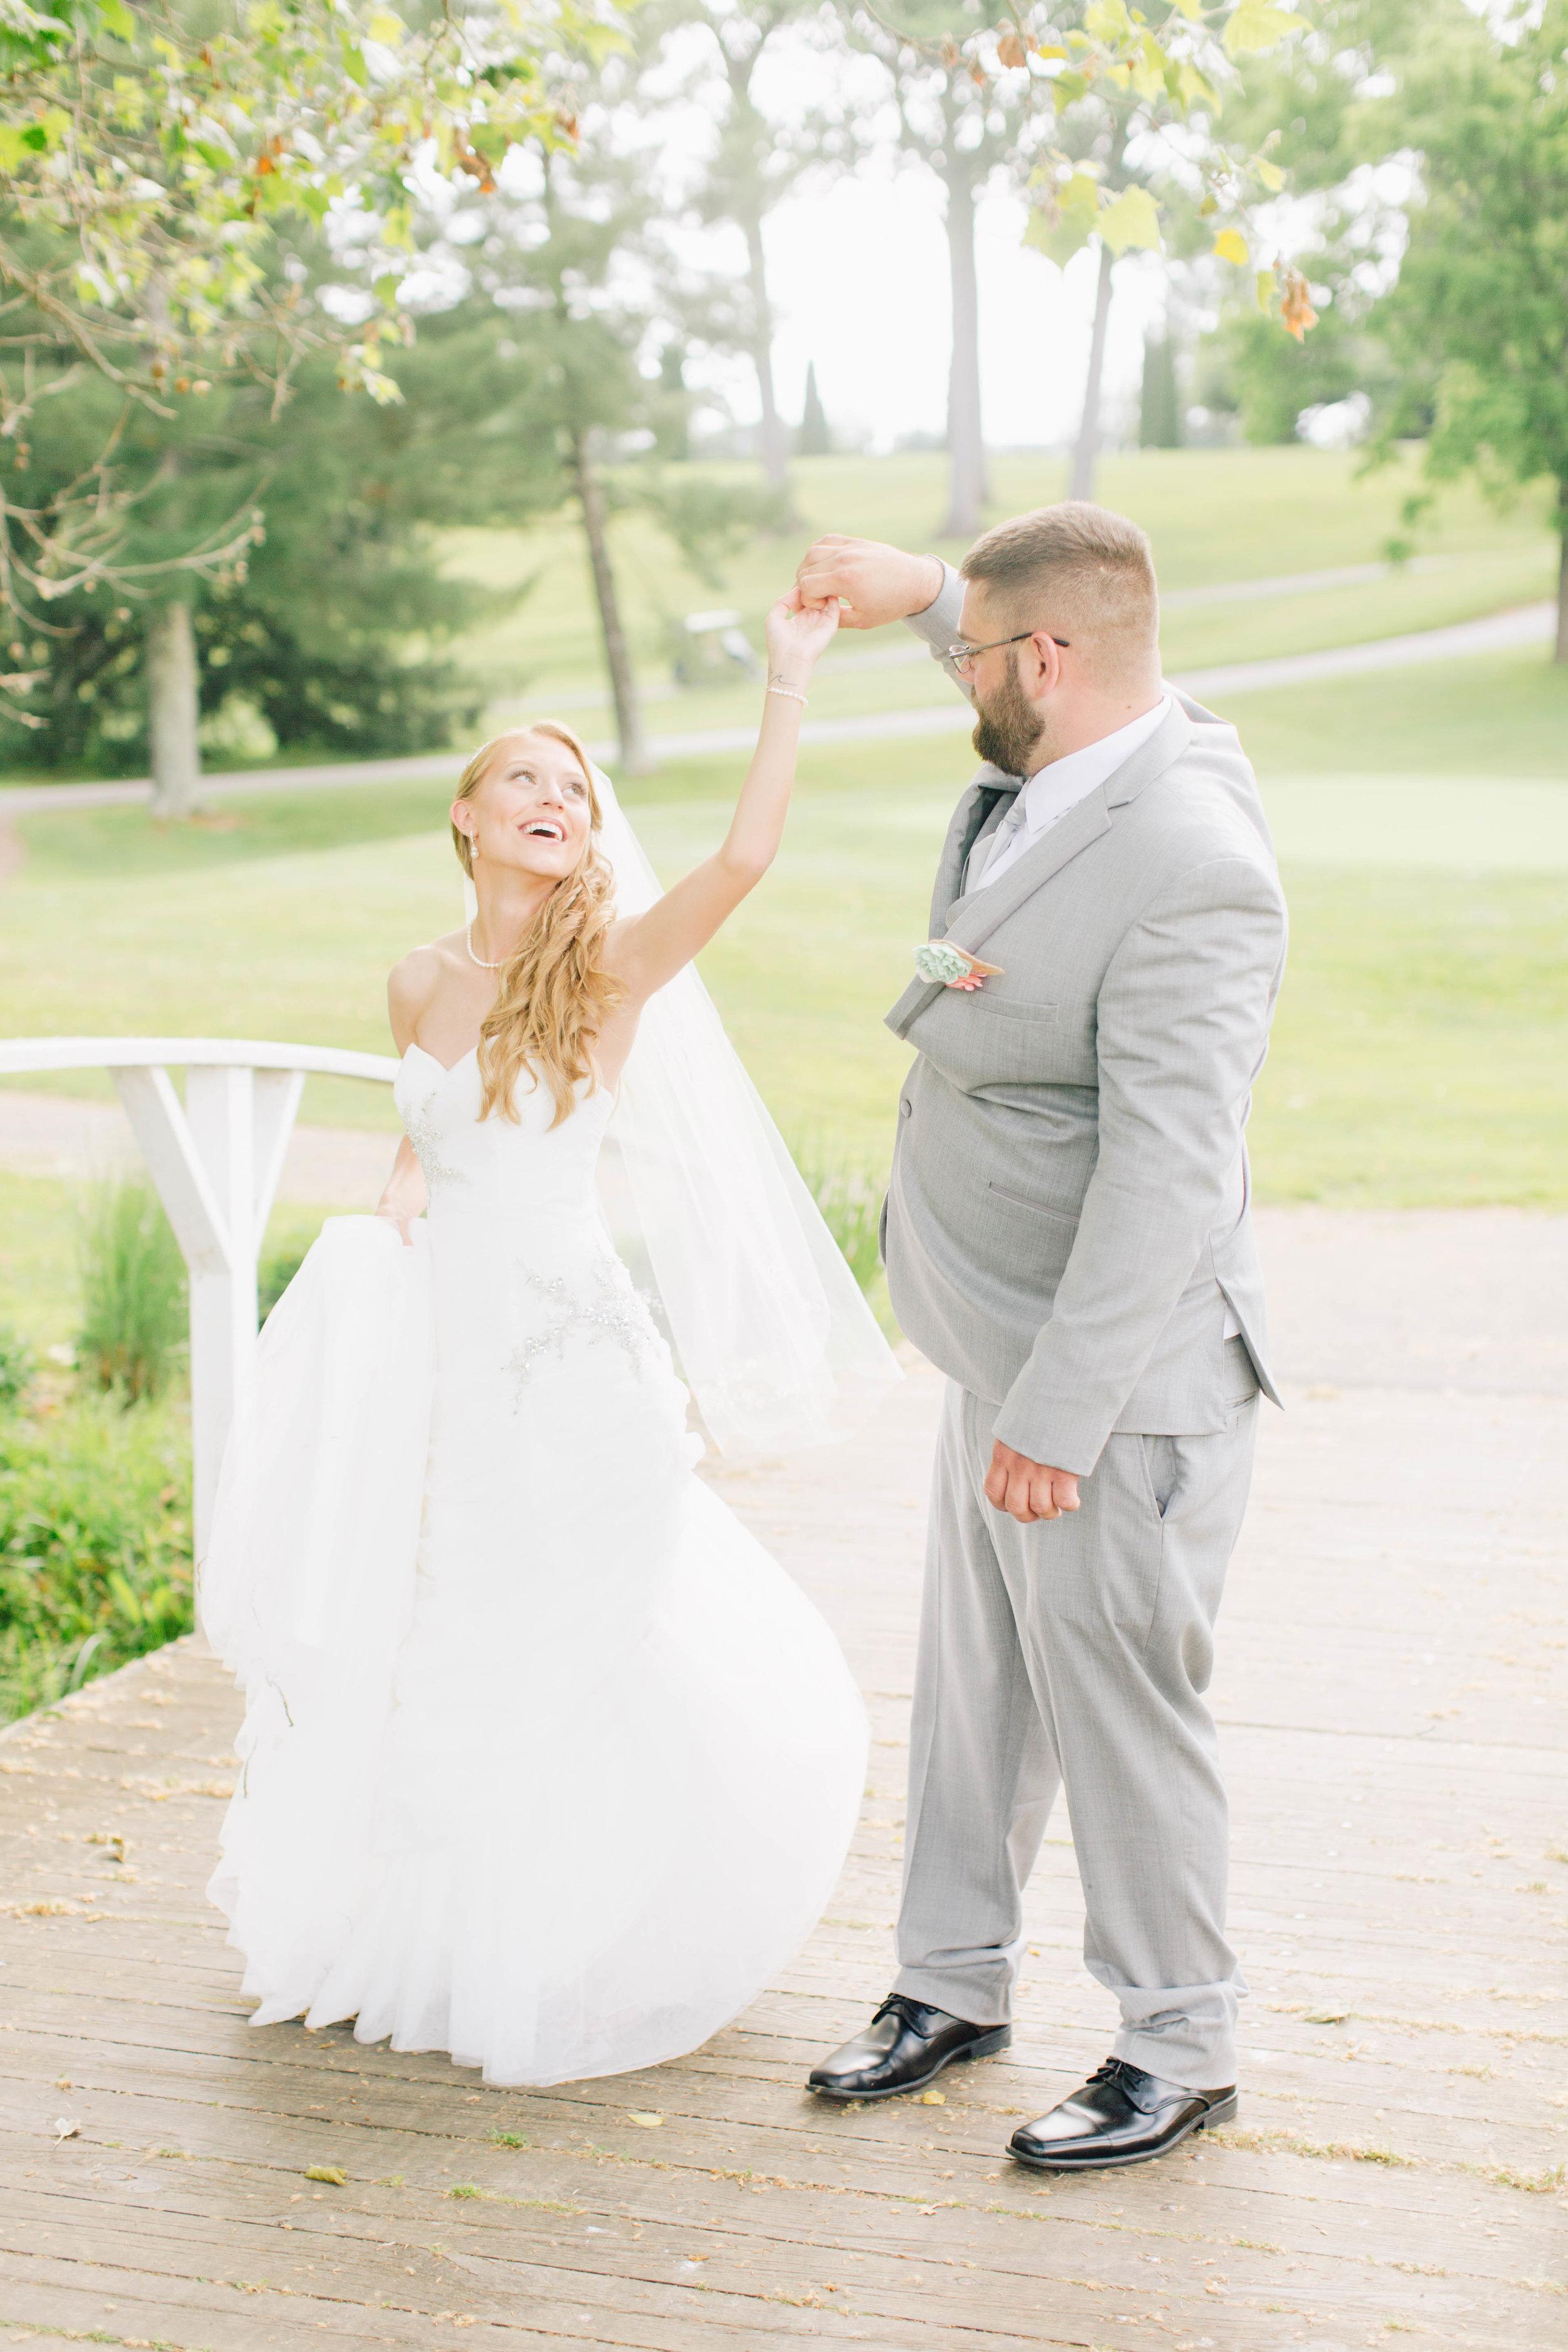 weddinghighlights-22.jpg